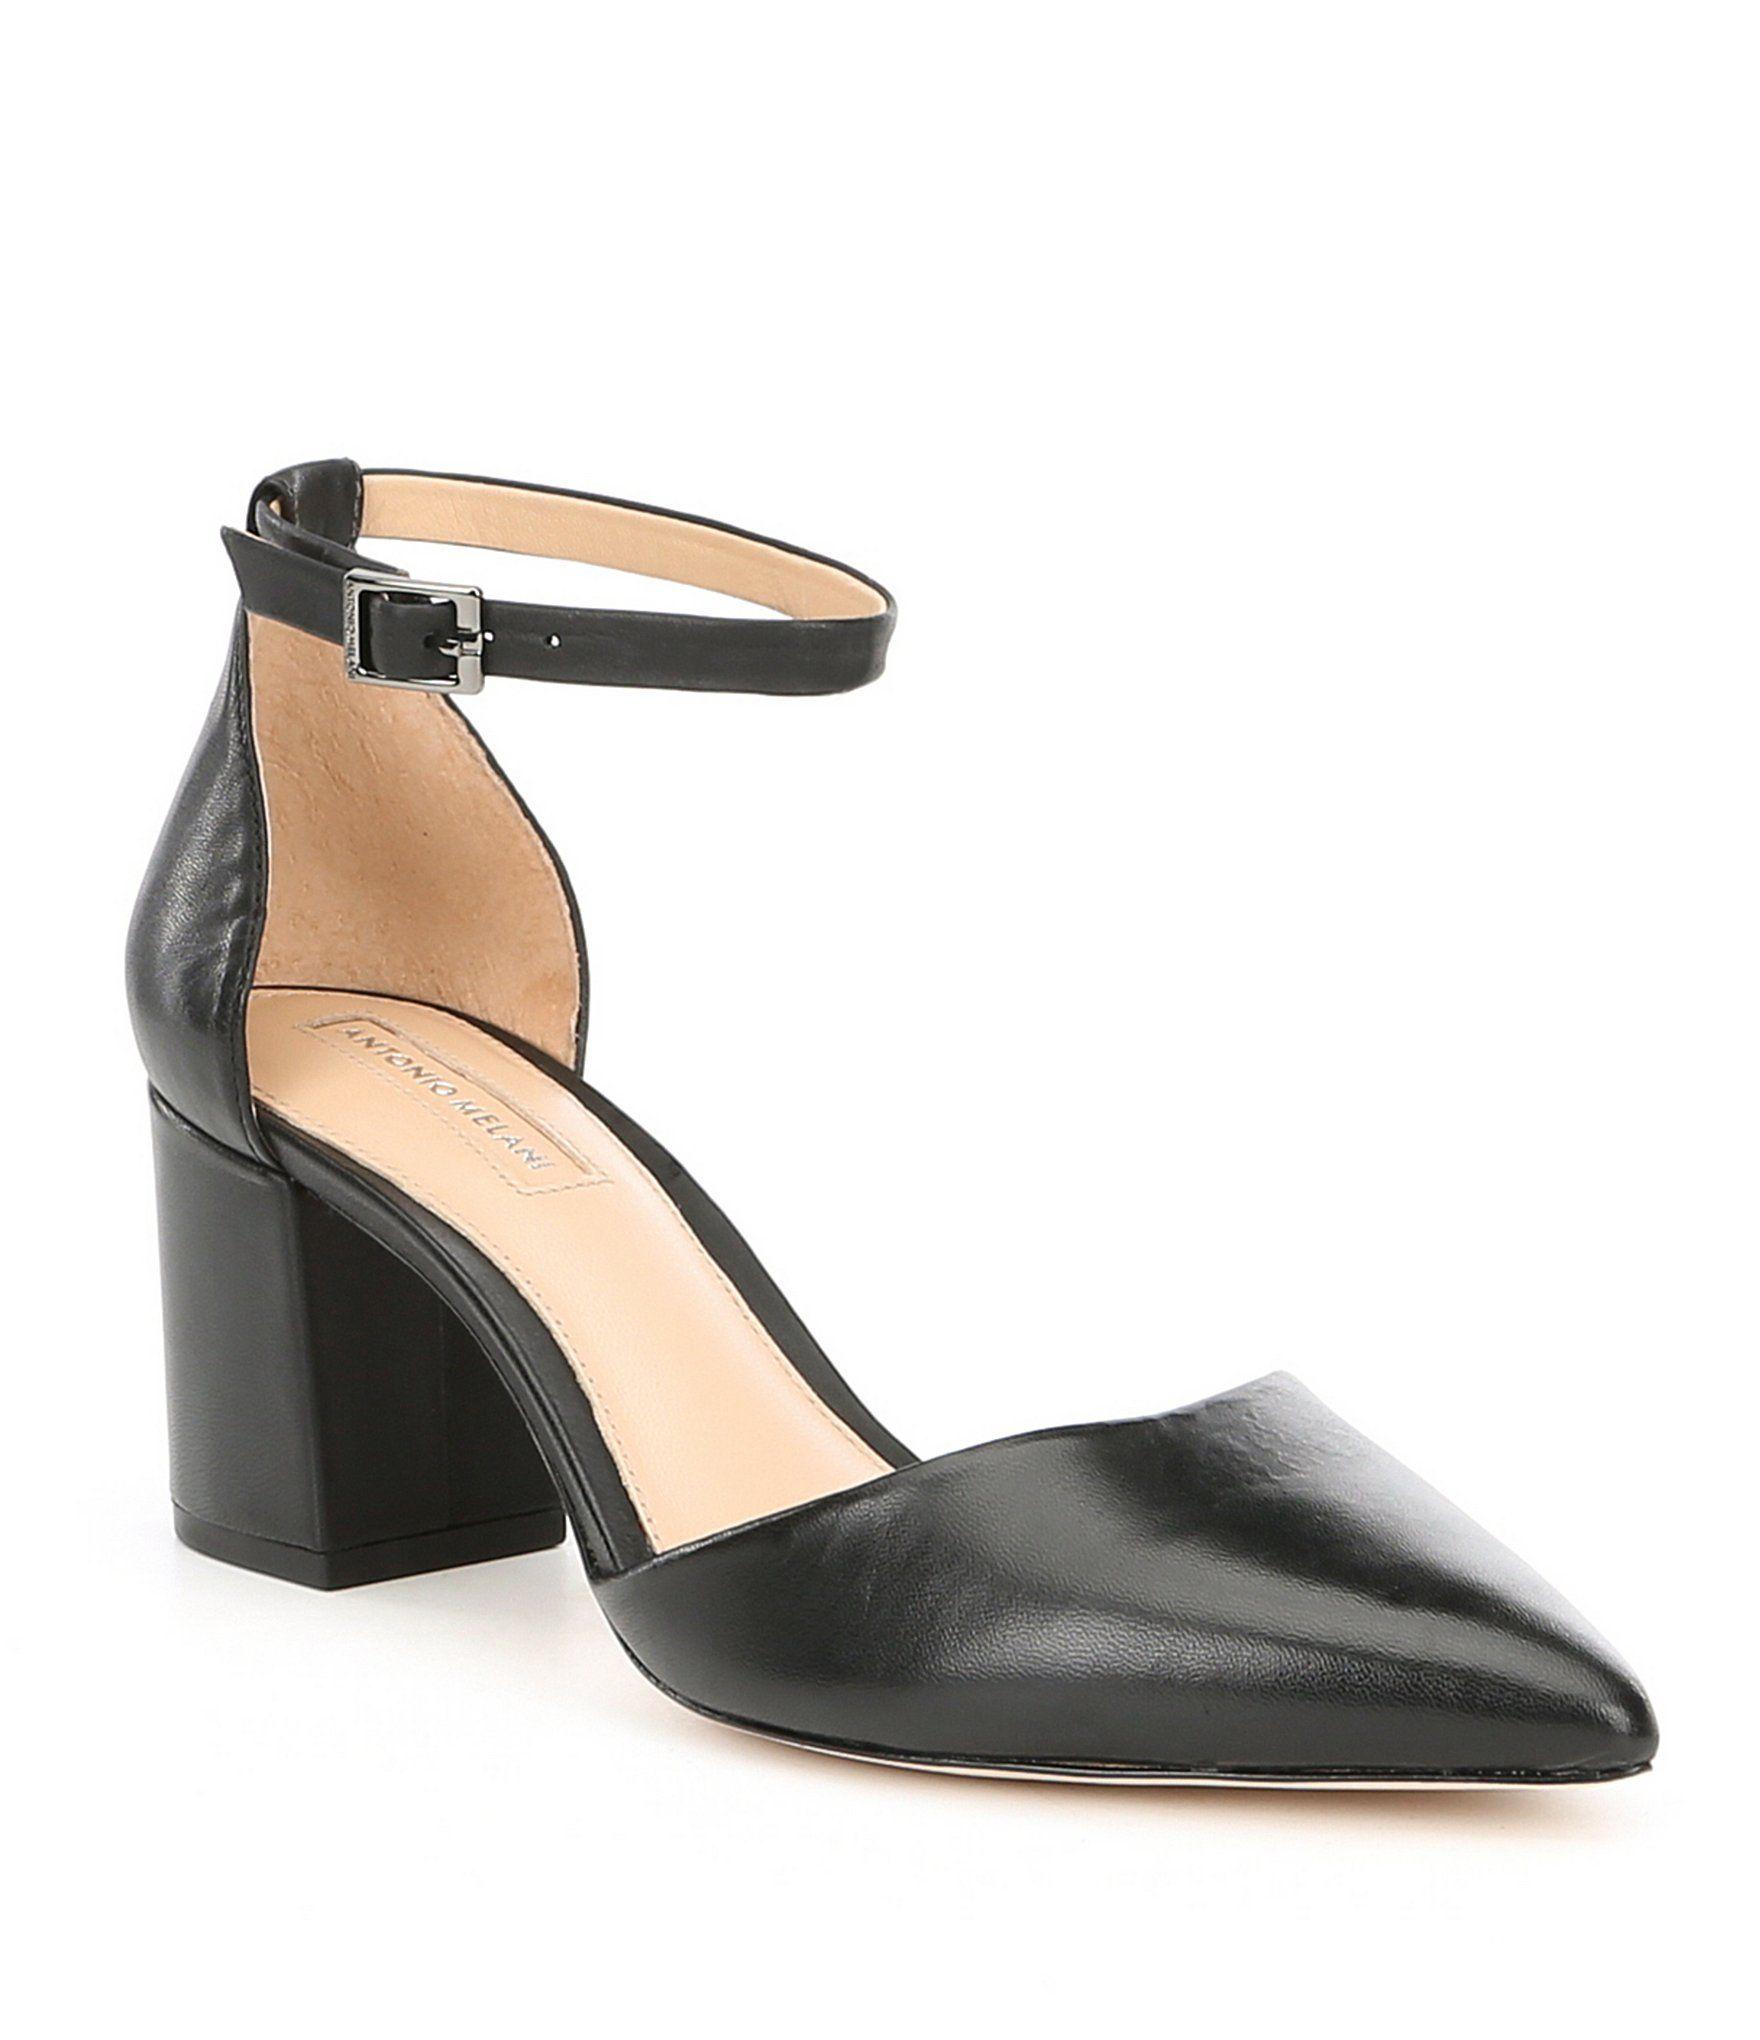 Antonio Melani Lynlee Mary Jane Ankle Strap Buckle Block Heel Dress Pumps dWCDAw